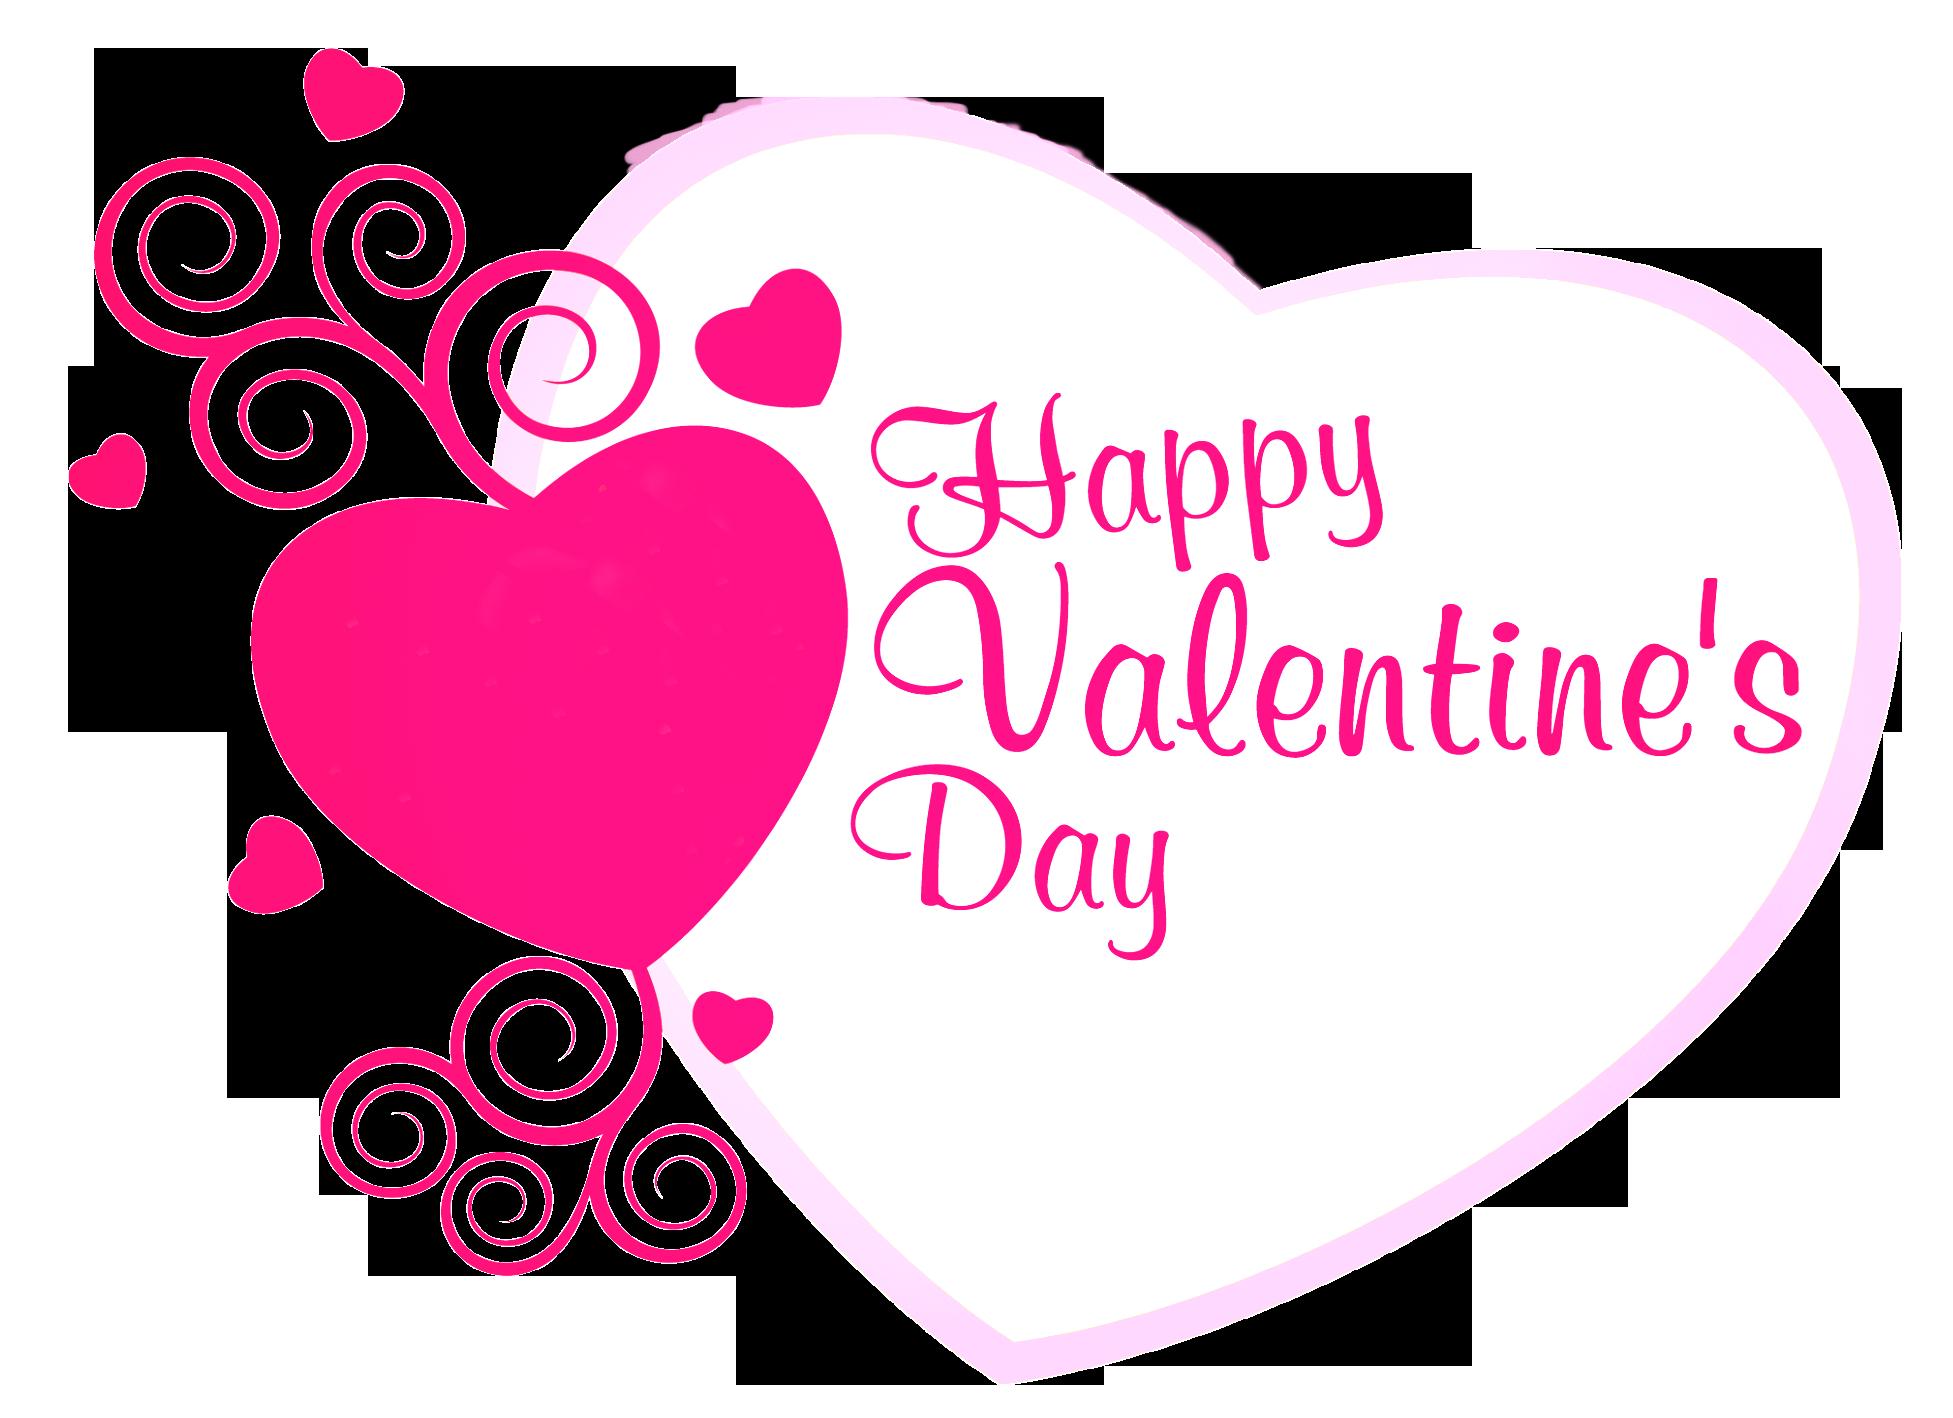 Heart clipart valentine\'s day #3.